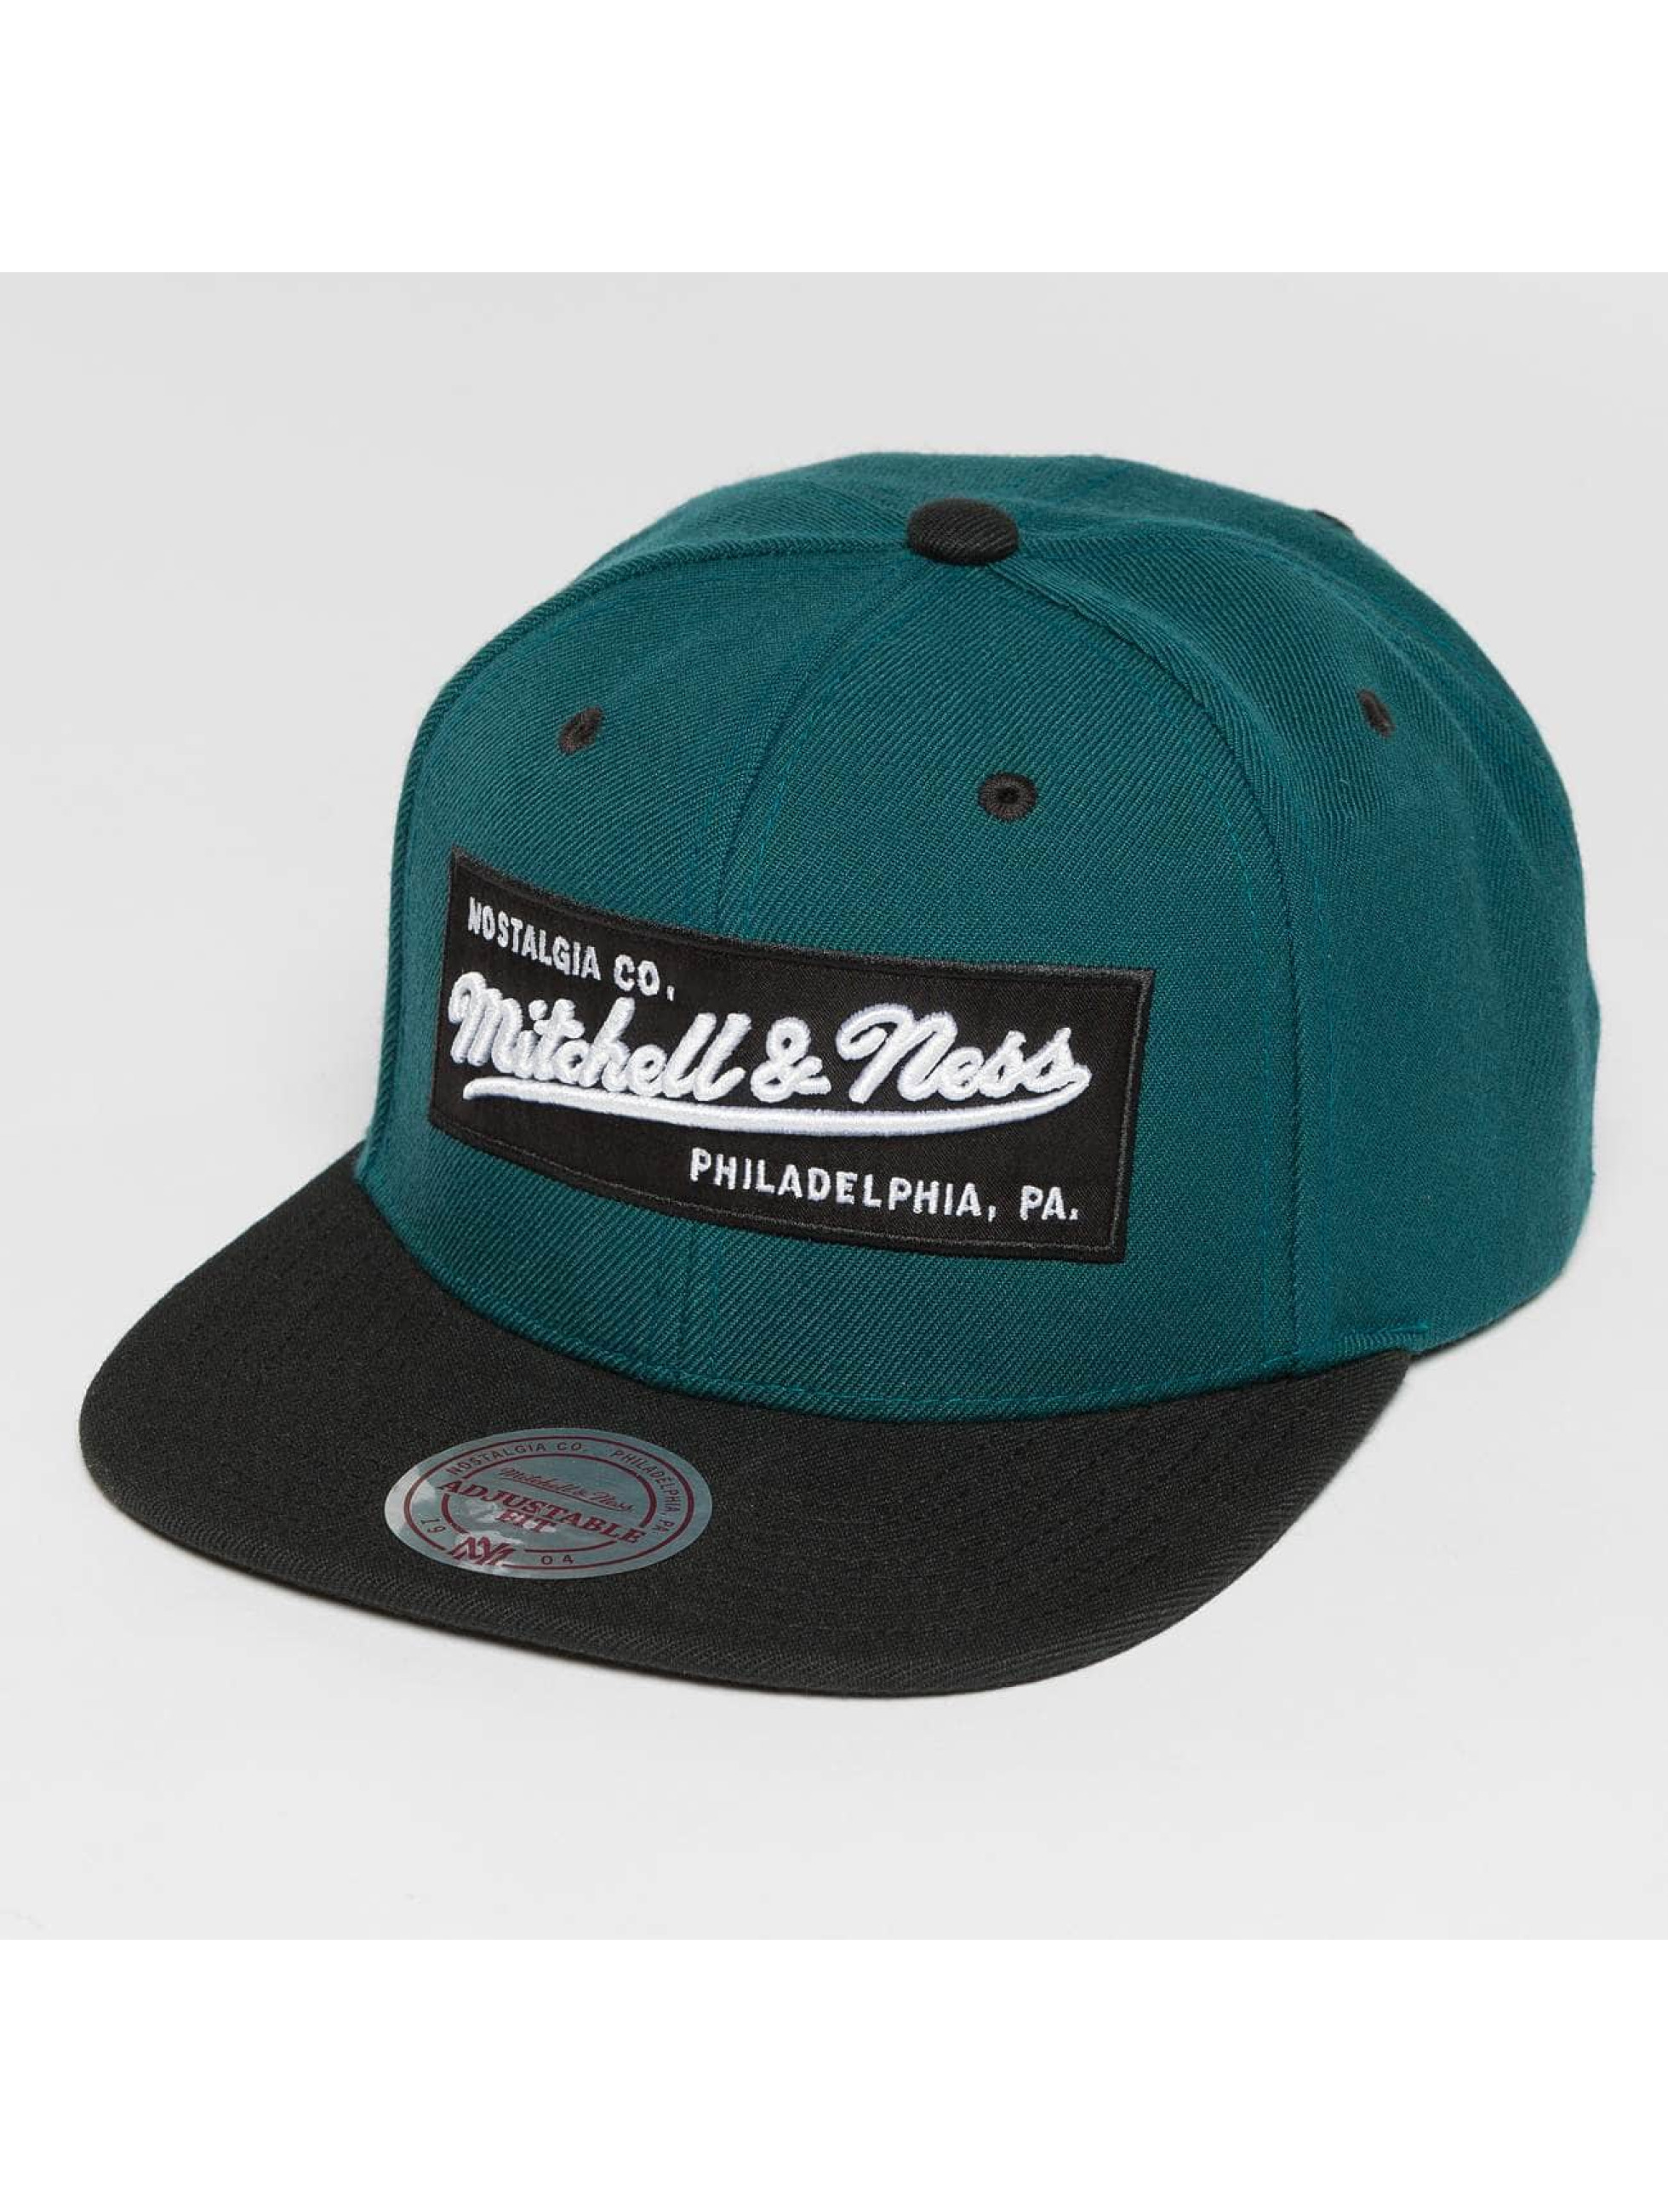 Mitchell & Ness Casquette Snapback & Strapback Own Brand Box Logo vert